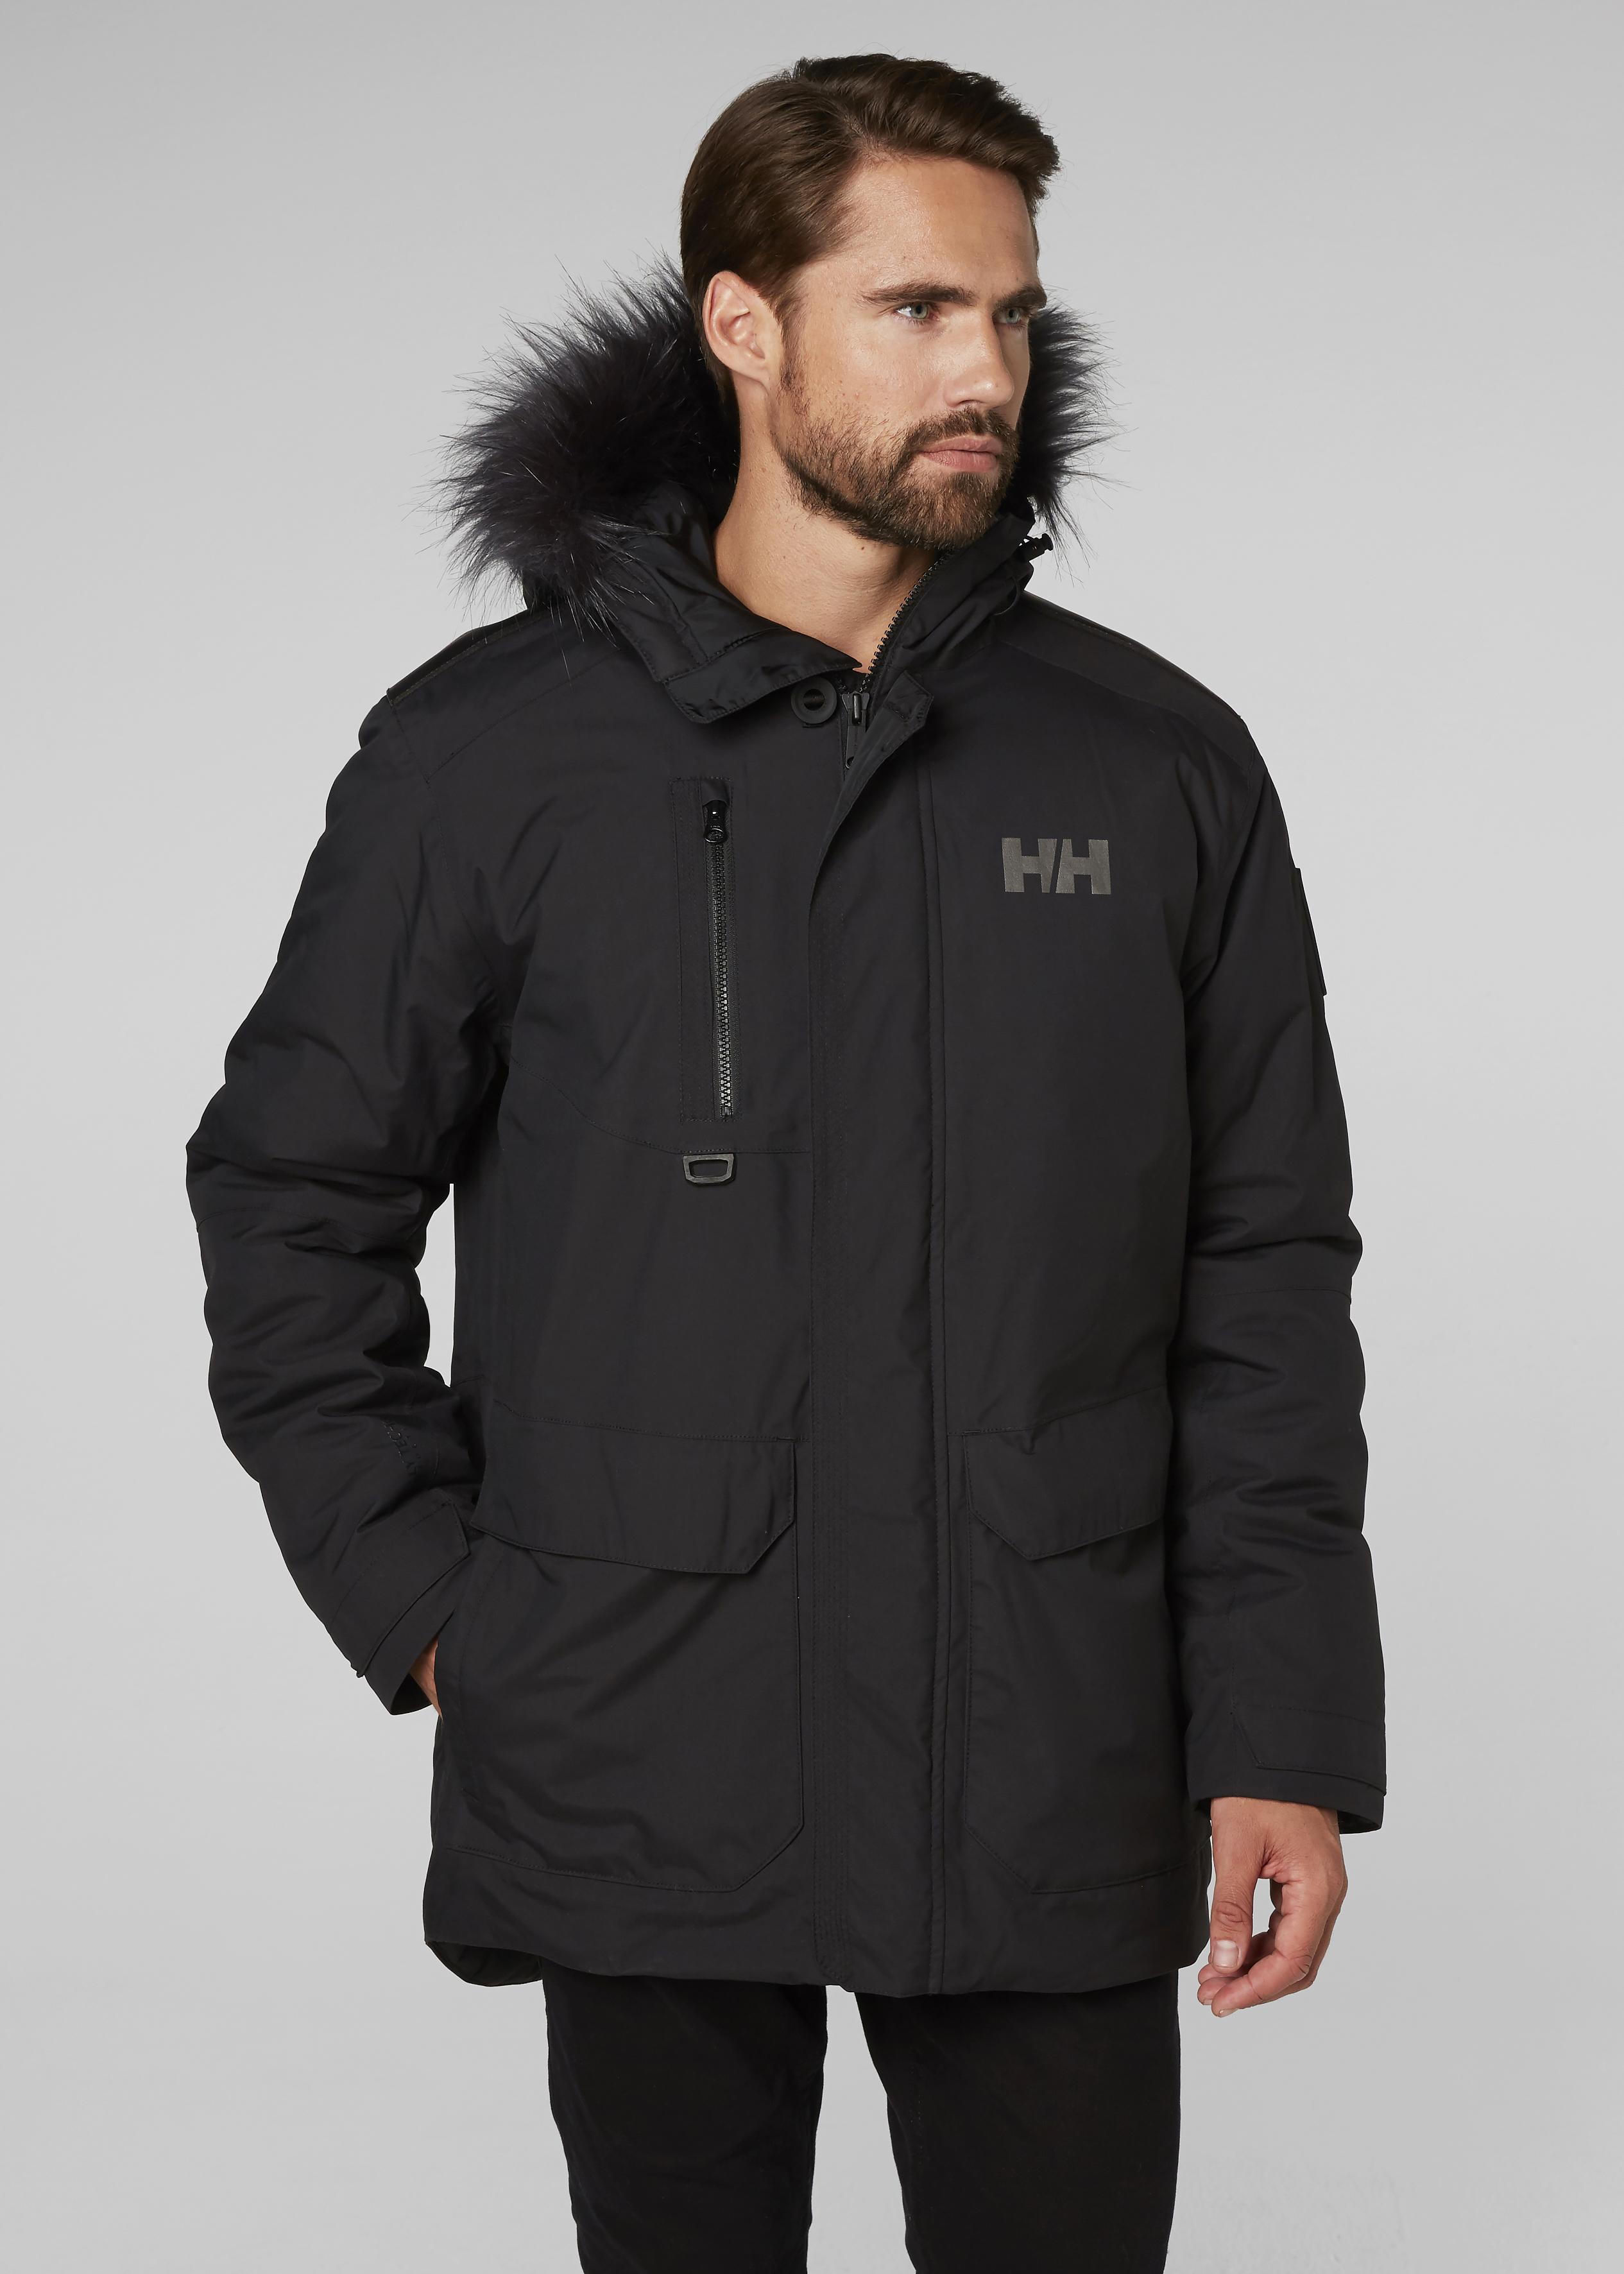 discount coupon modern techniques wholesale dealer Helly Hansen Svalbard Parka - Men's